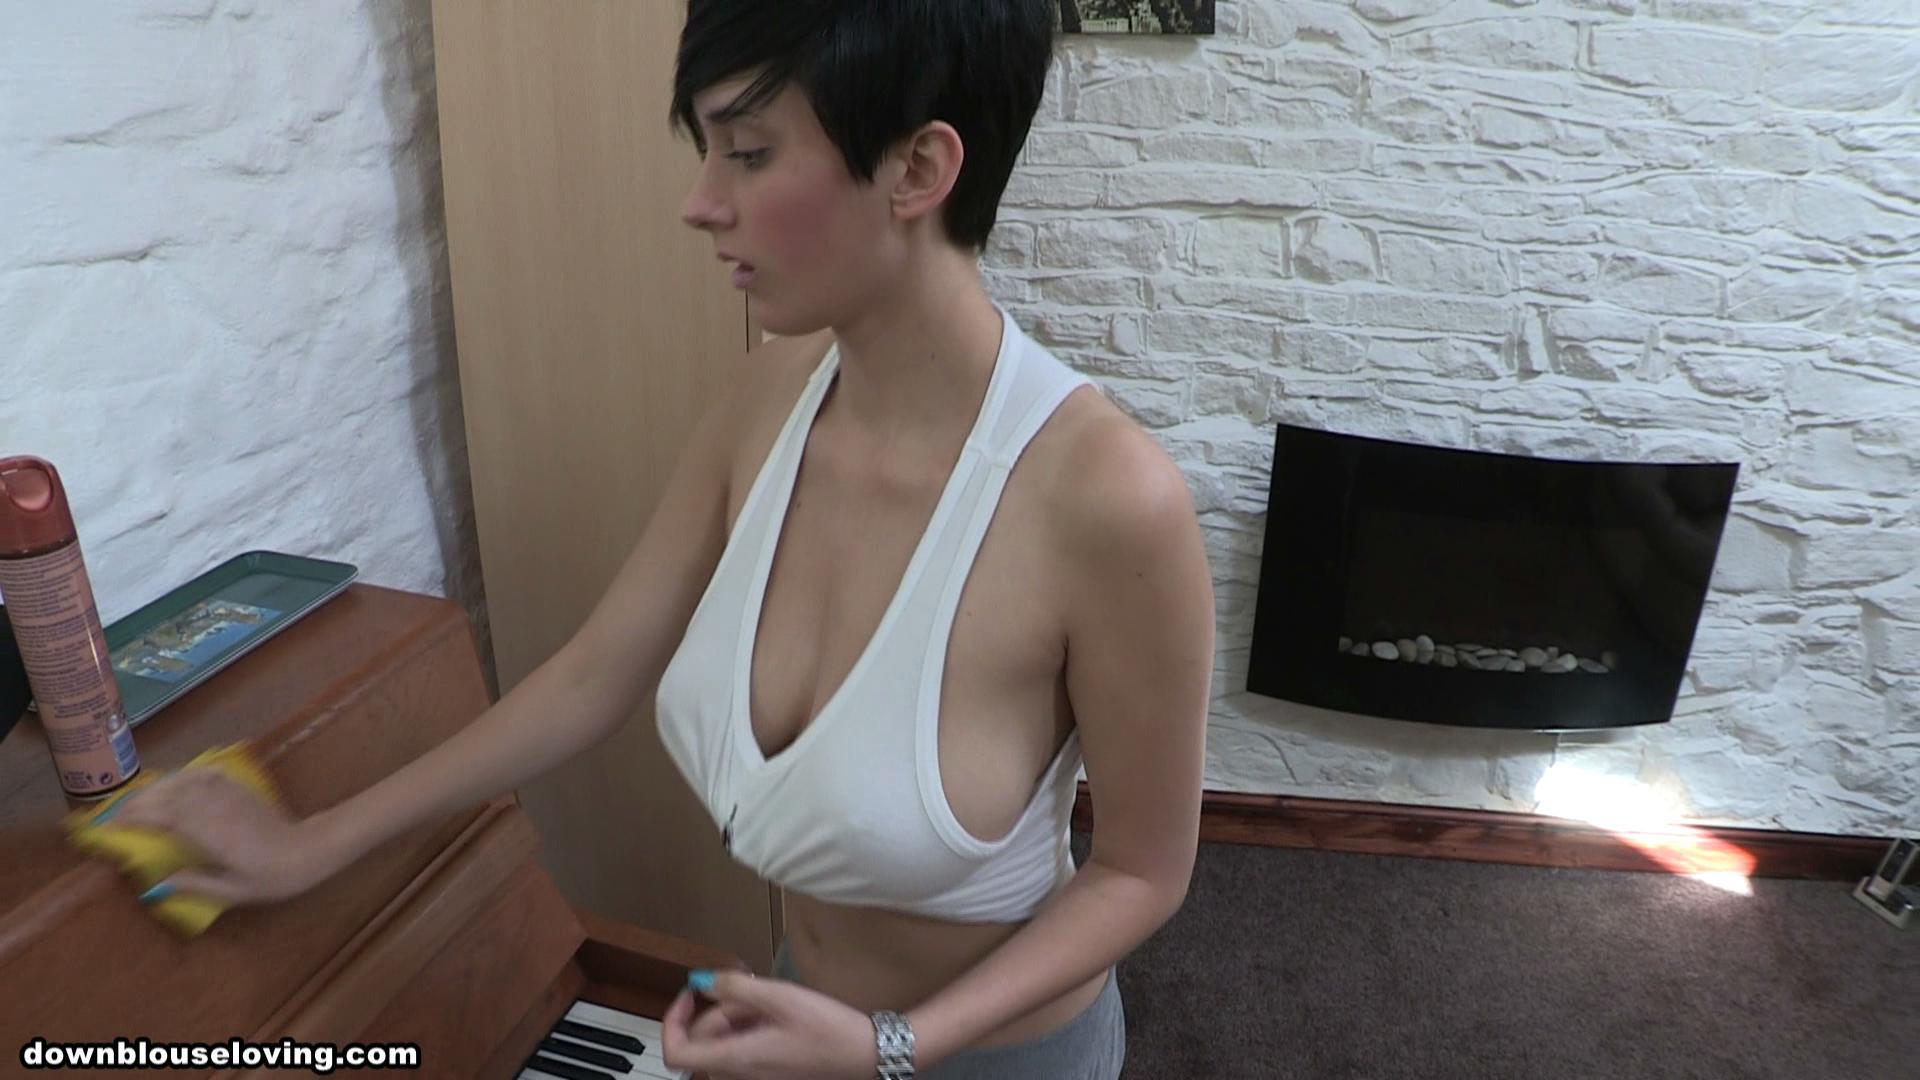 naked girls fuckimg hard sexy